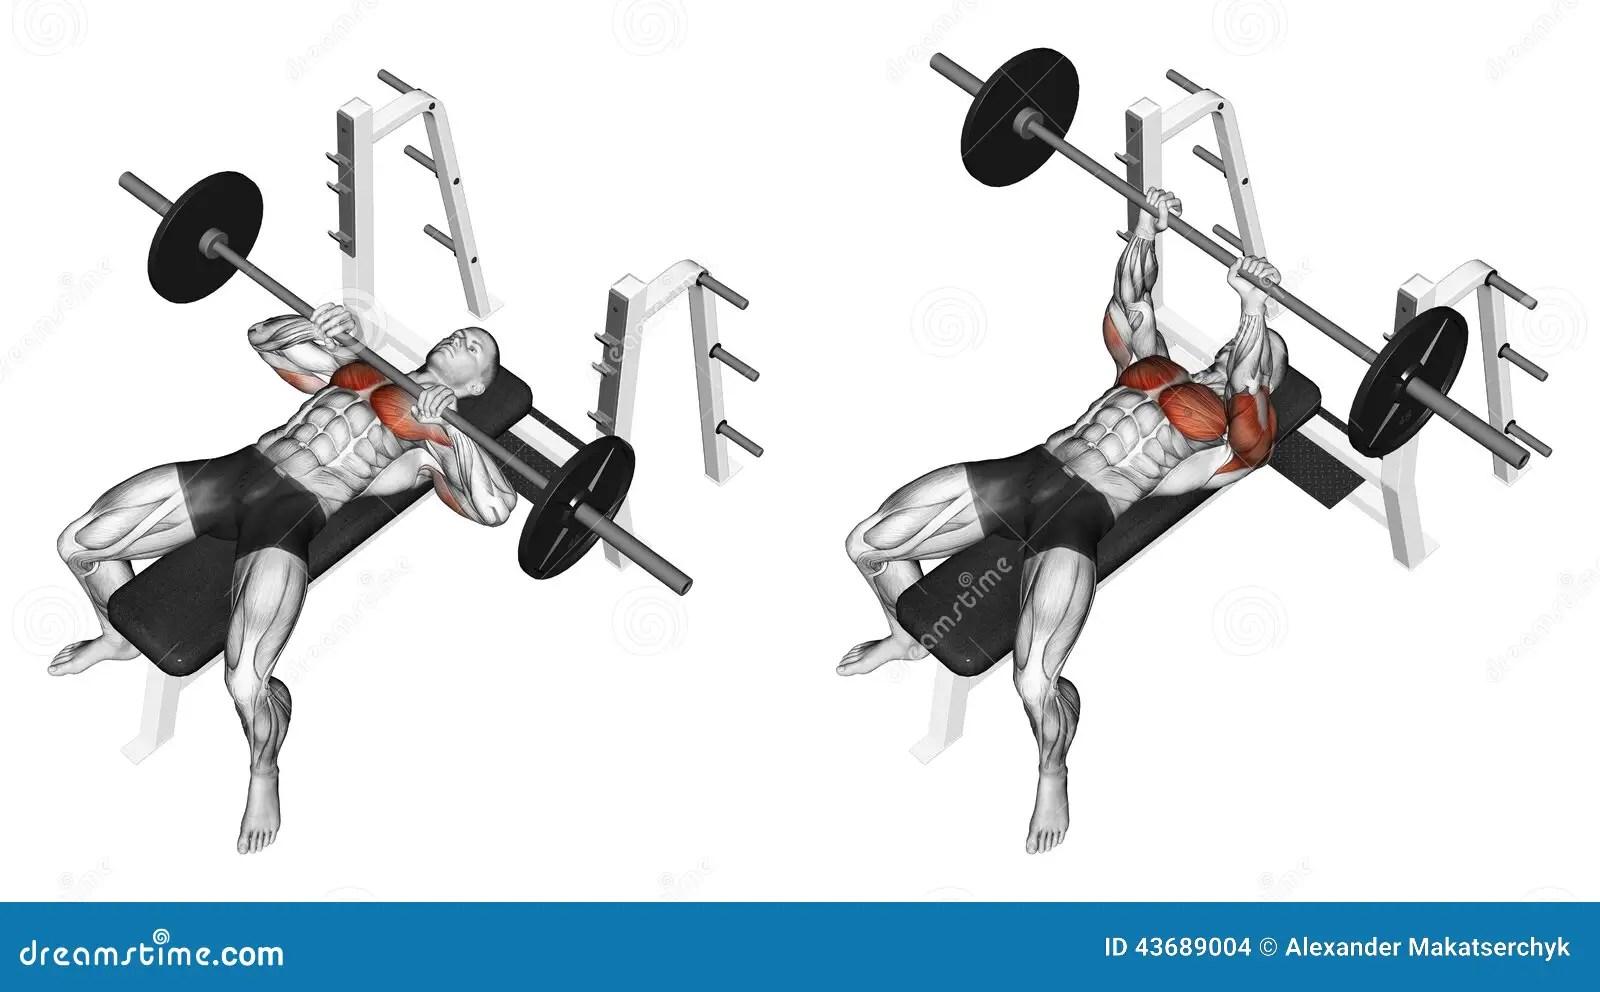 Exercising Rod Narrow Grip Bench Press Lying On Stock